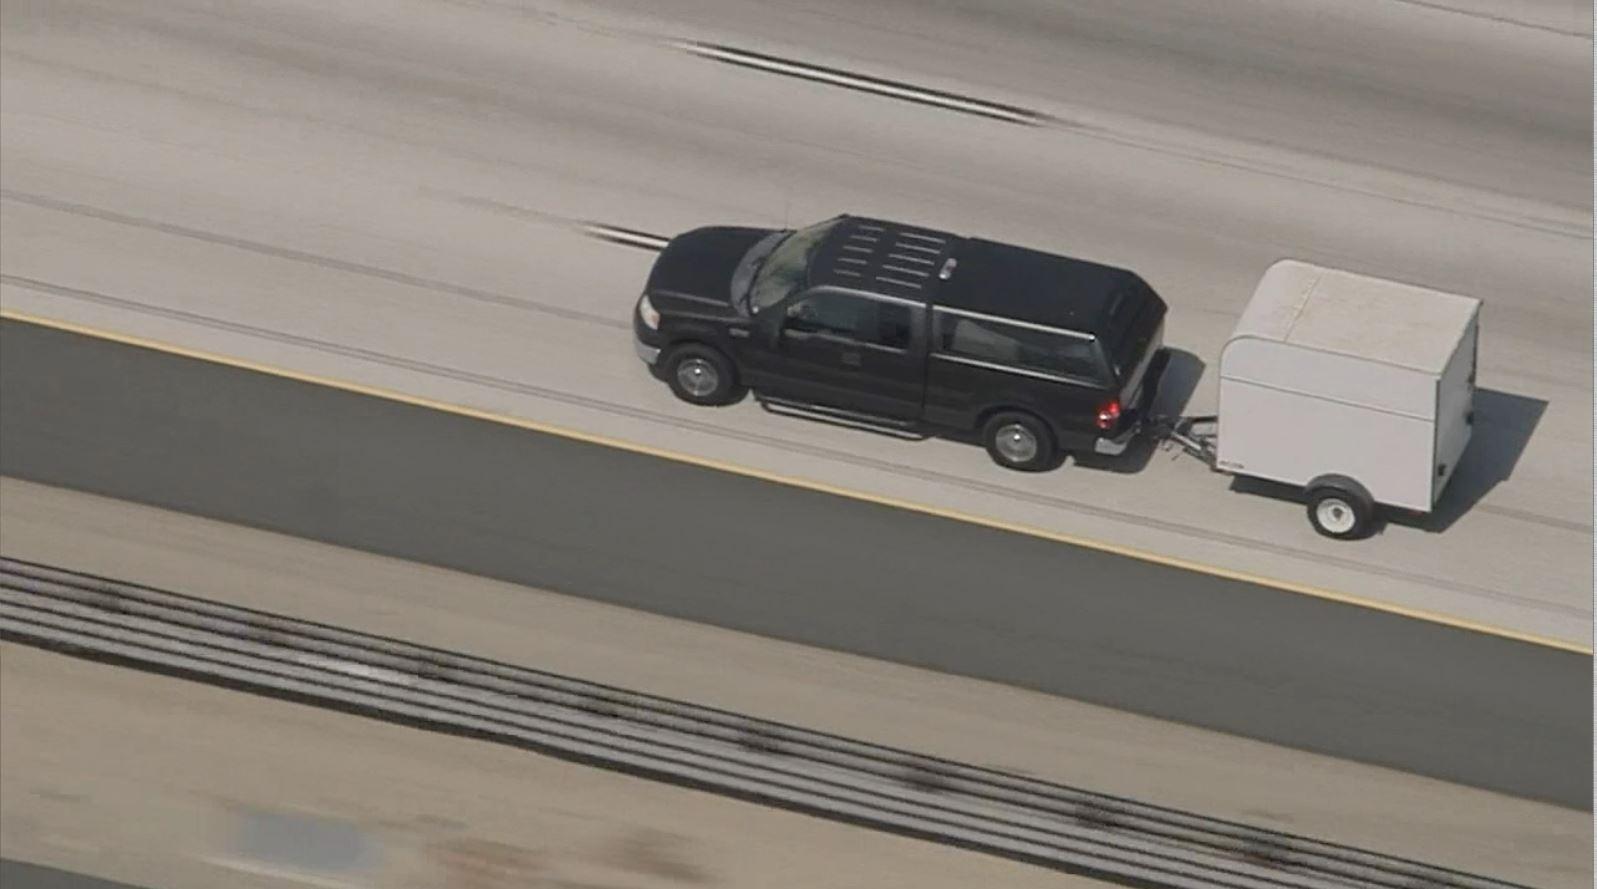 Deputies pursue a pickup pulling a trailer Monday Sept. 18, 2017 in San Bernardino County.